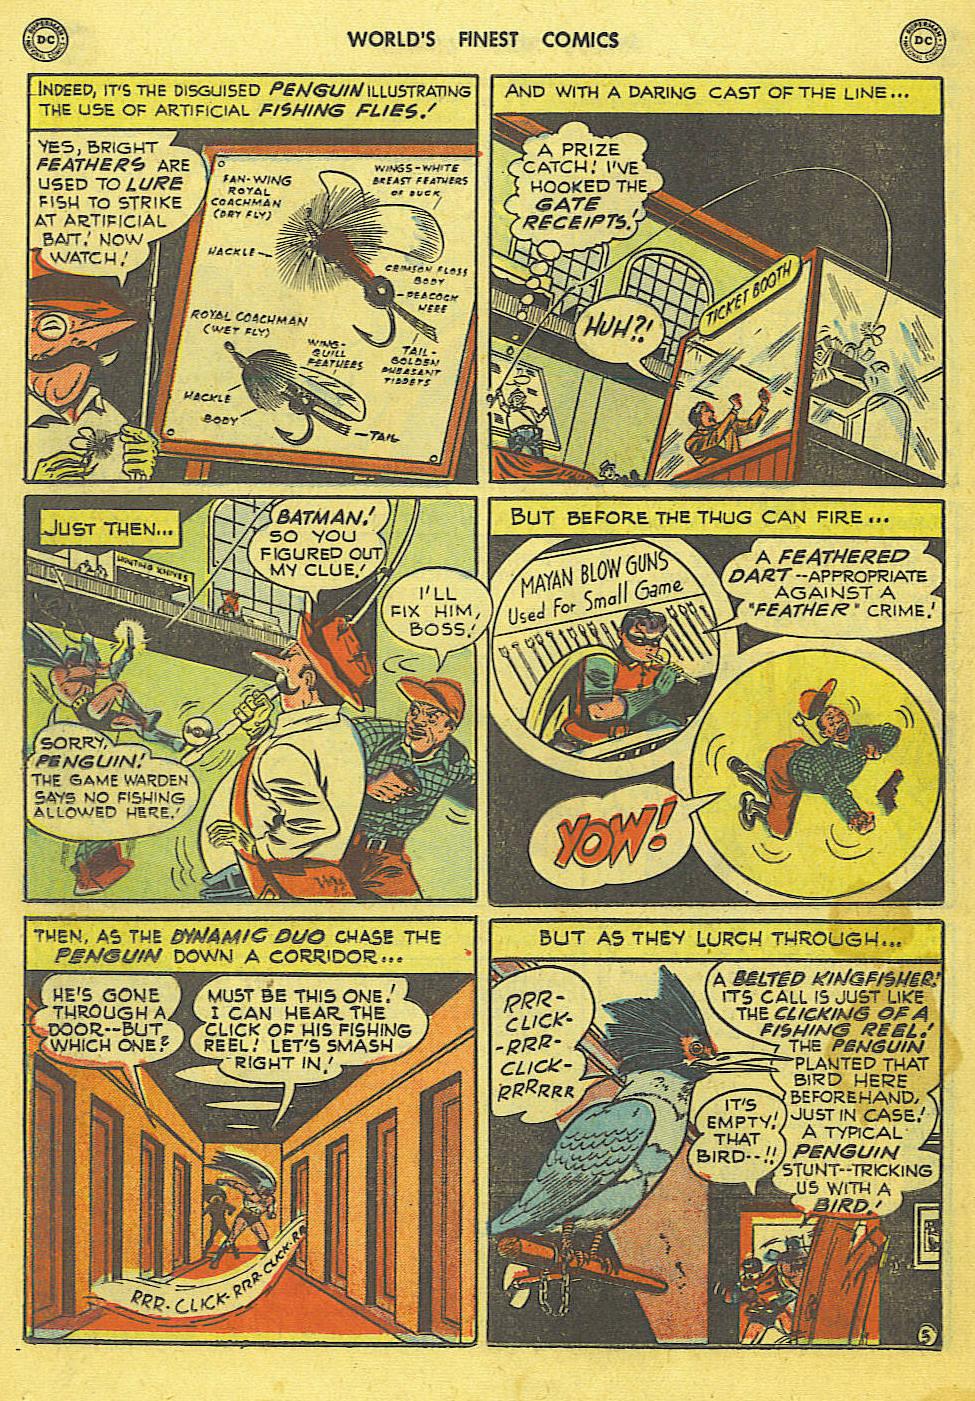 Read online World's Finest Comics comic -  Issue #49 - 67